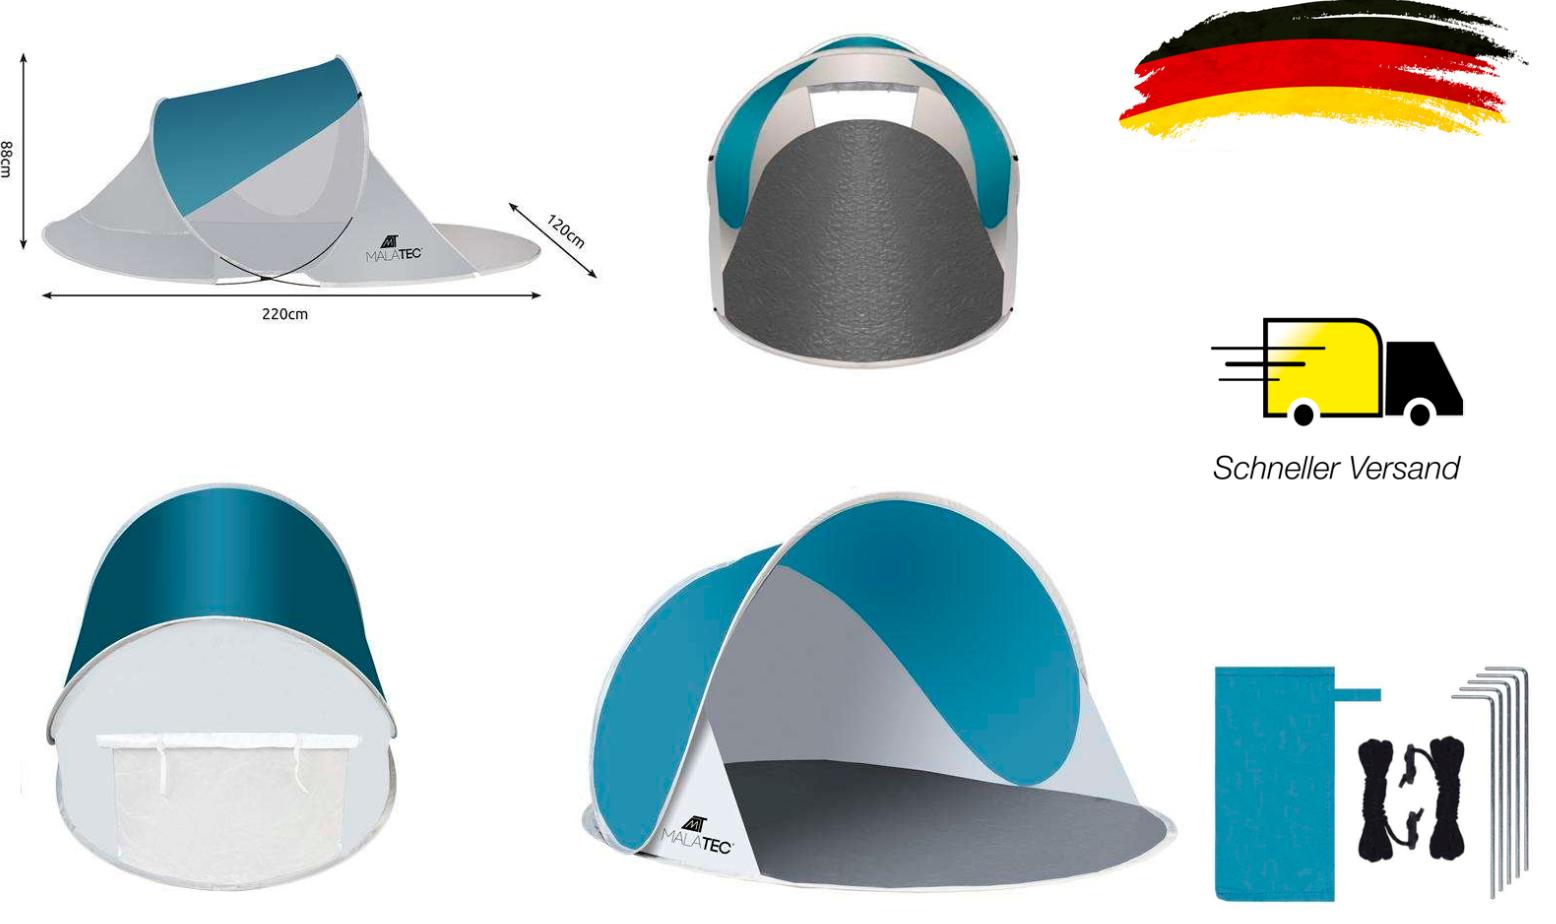 Strand Wurfzelt Sonnenschutz XXL Pop Up Strandmuschel 200x120x90 cm UV50